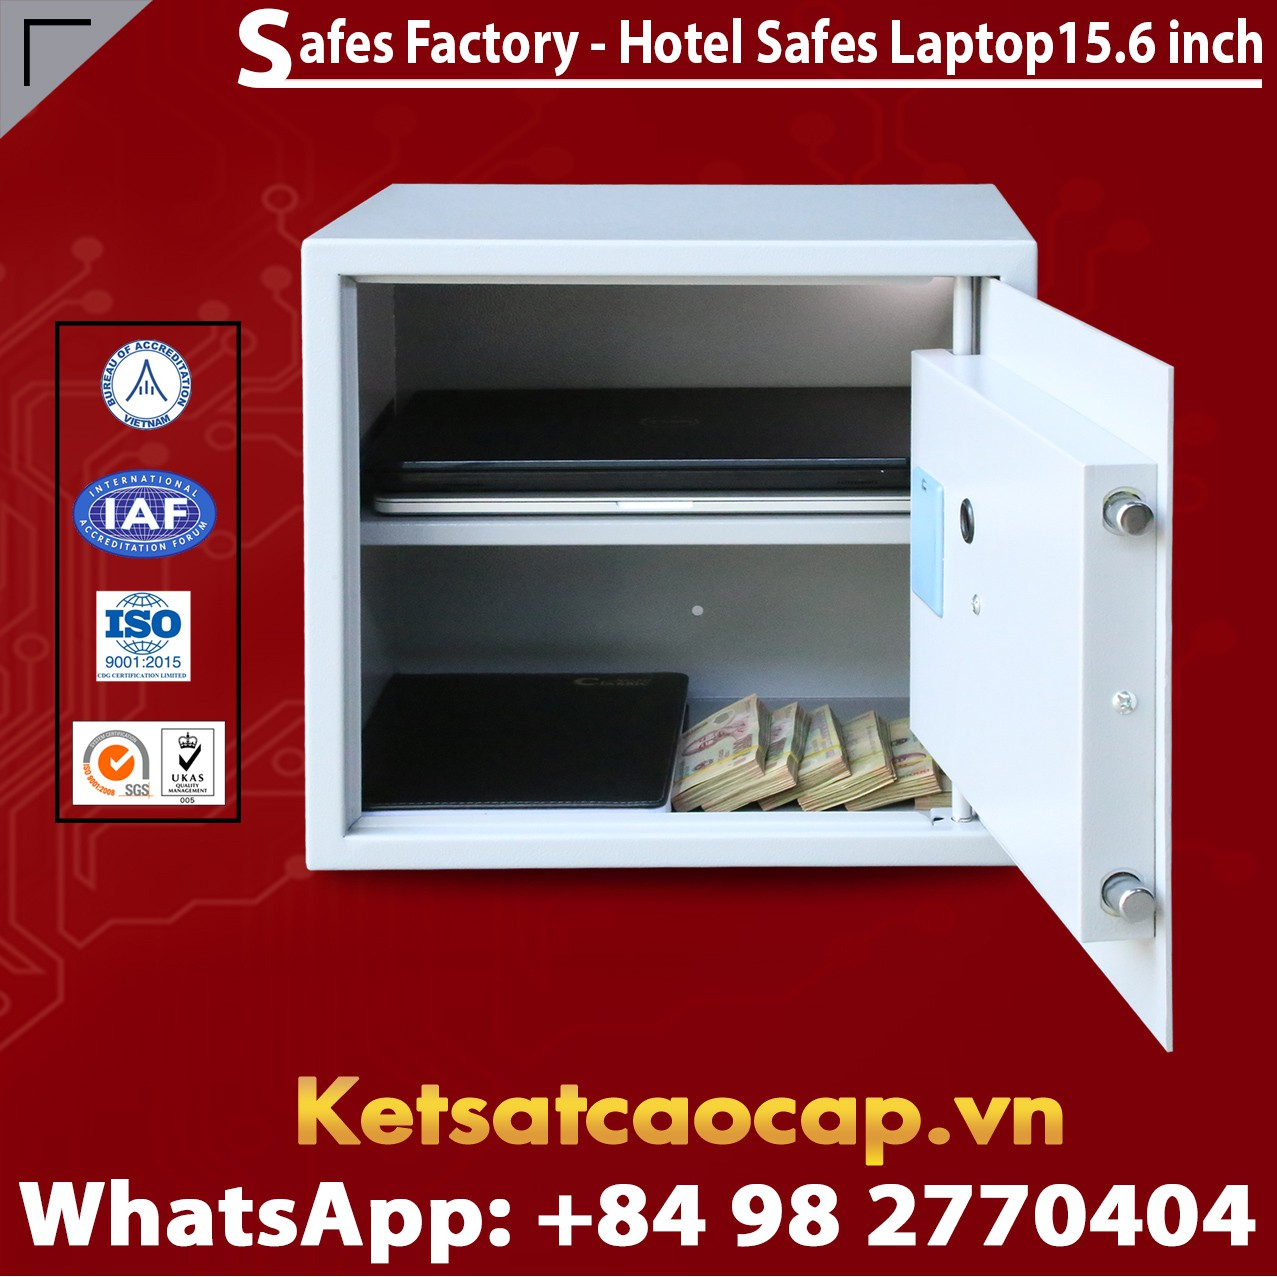 Két Sắt Khách Sạn Hà Nội Hotel Safes WELKO Laptop 15.6 Inch